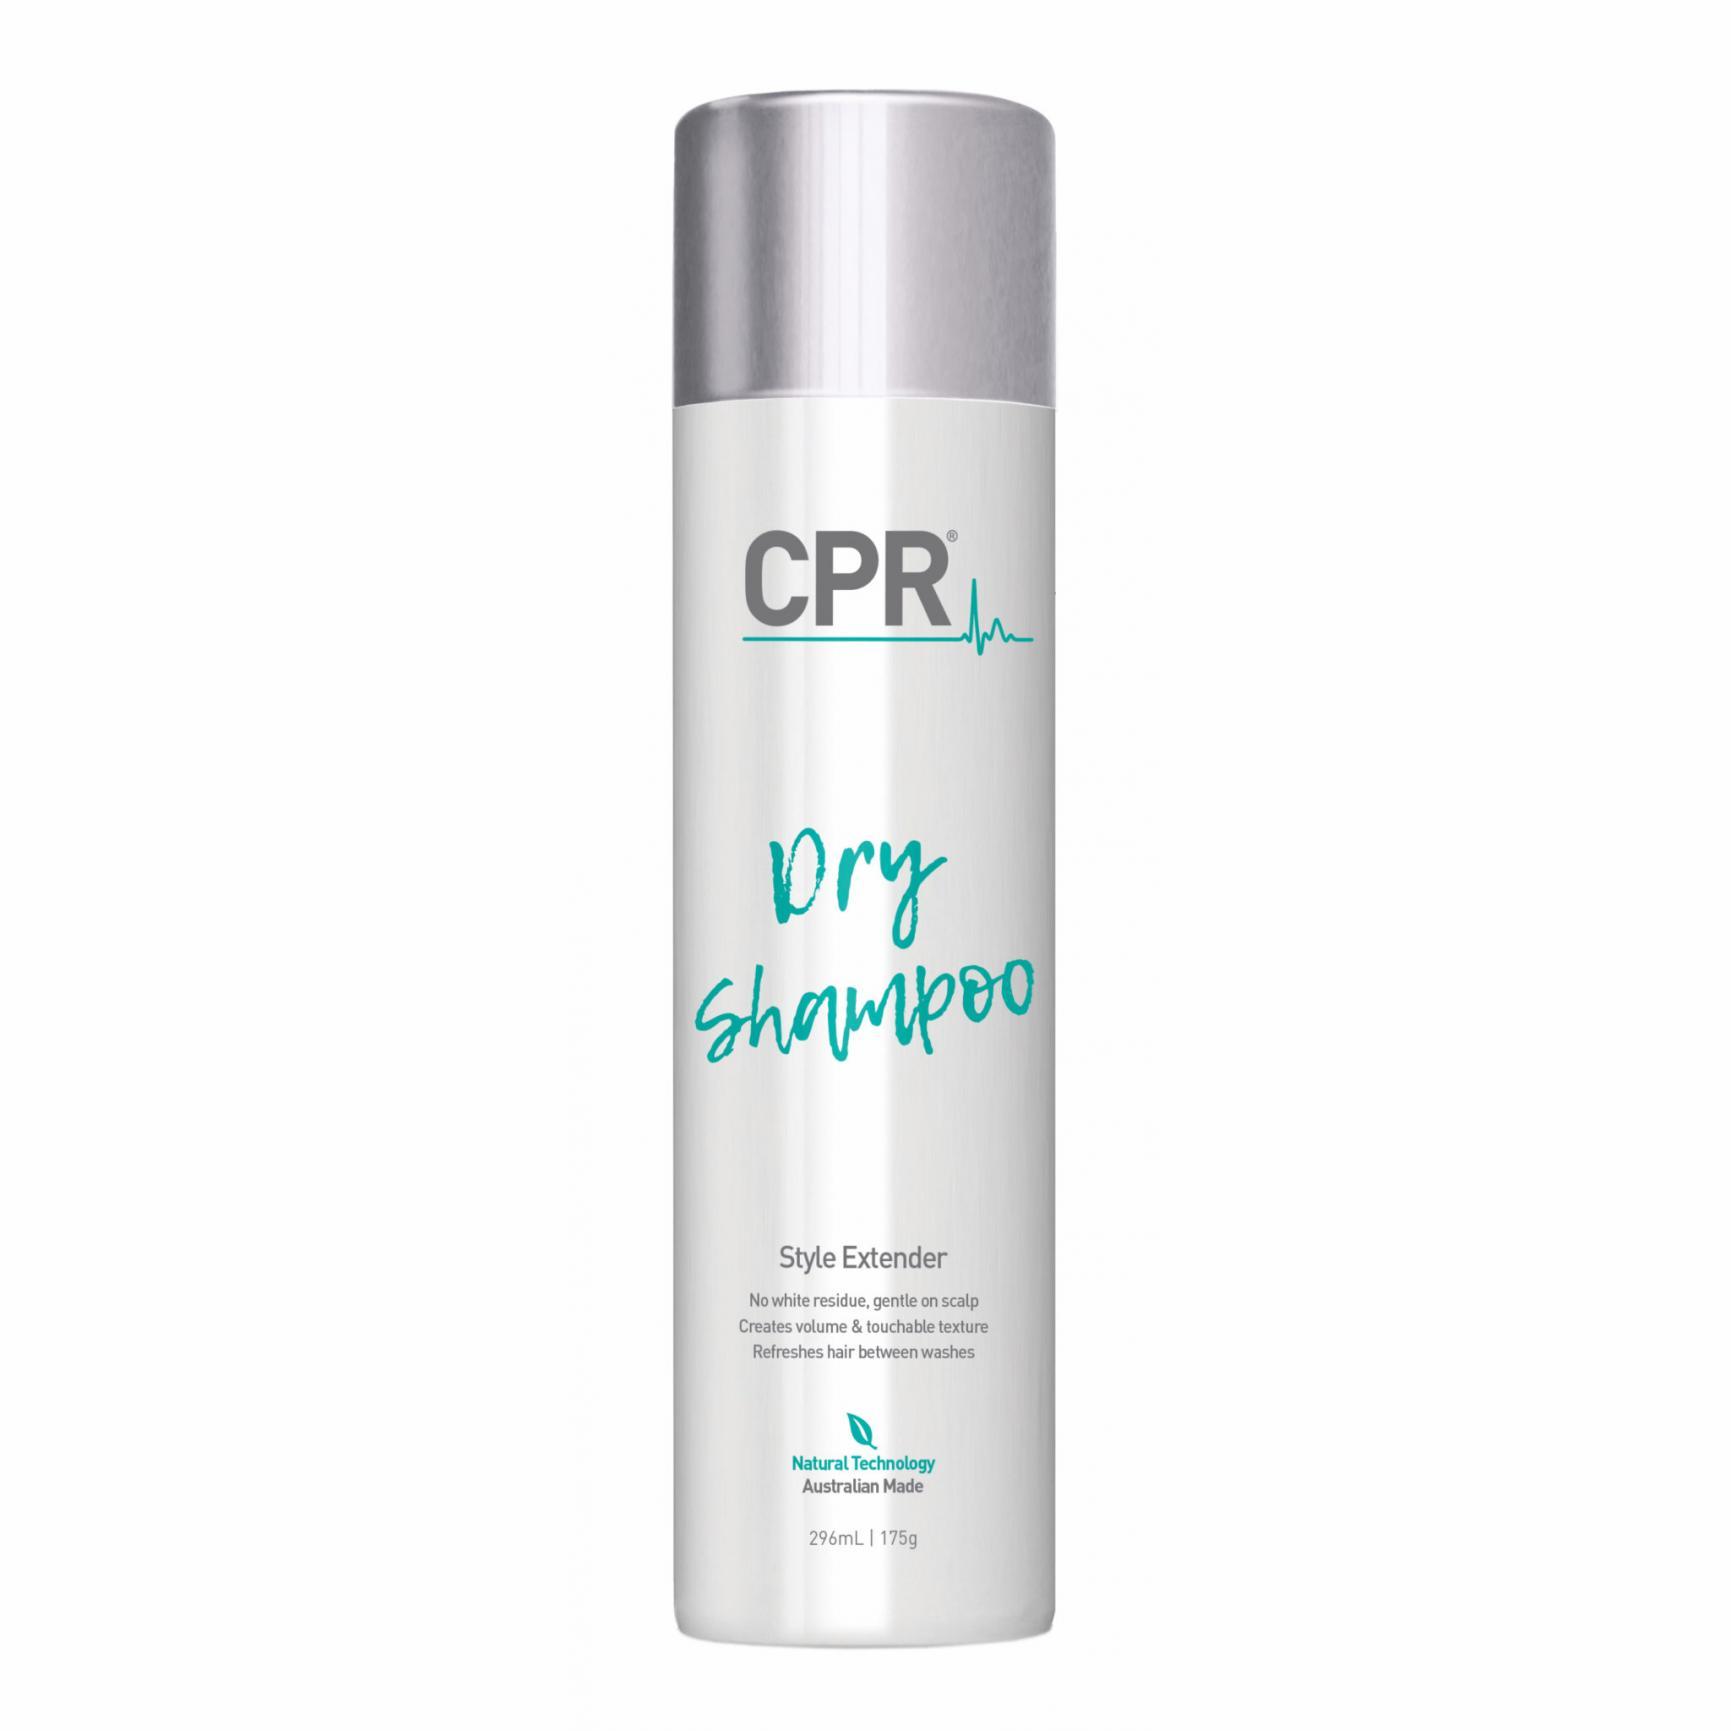 CPR Dry Shampoo